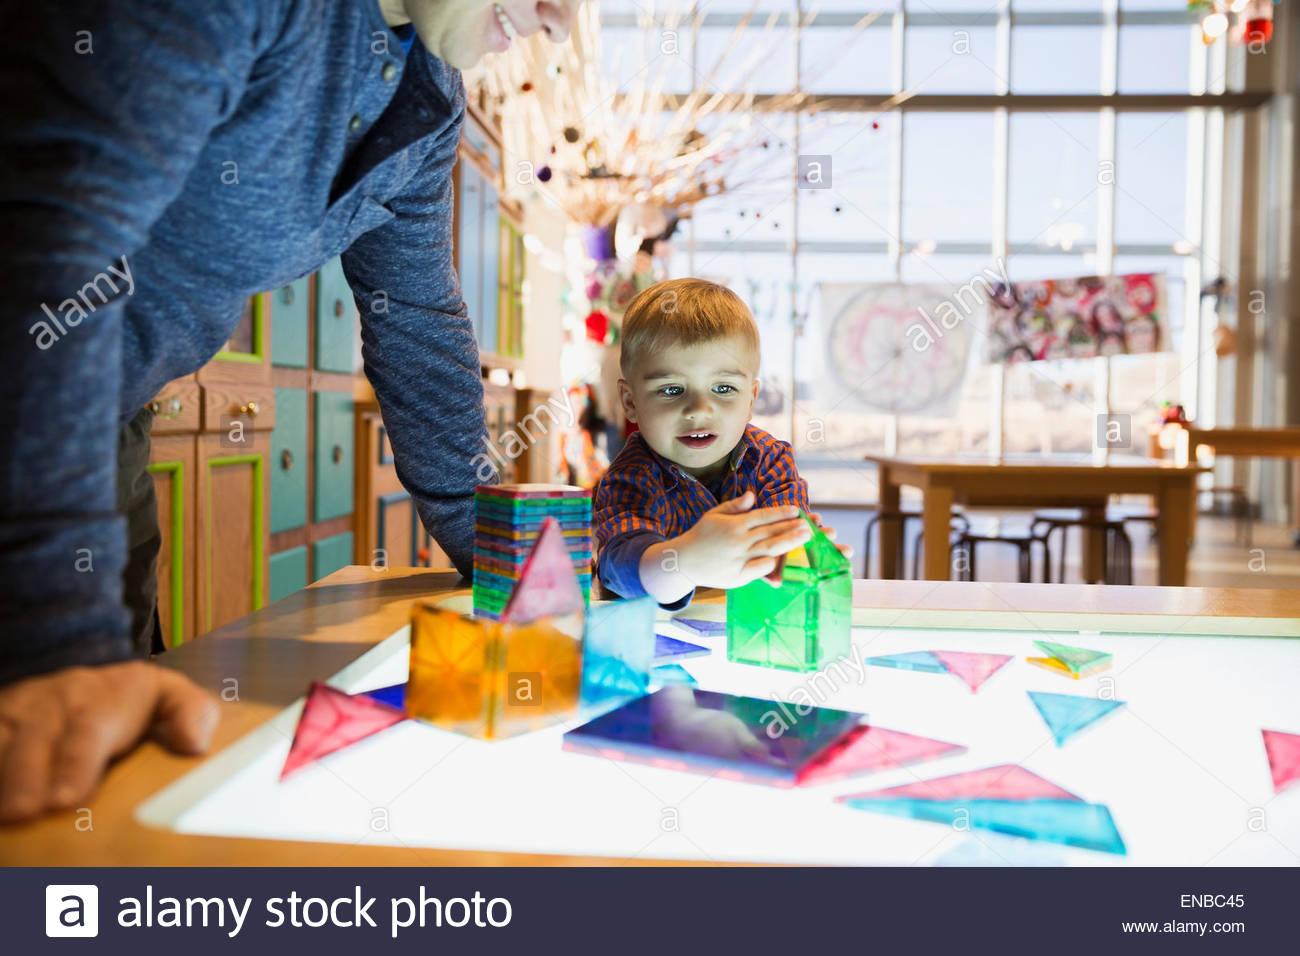 Padre e hijo jugando modelos geométricos science center Imagen De Stock